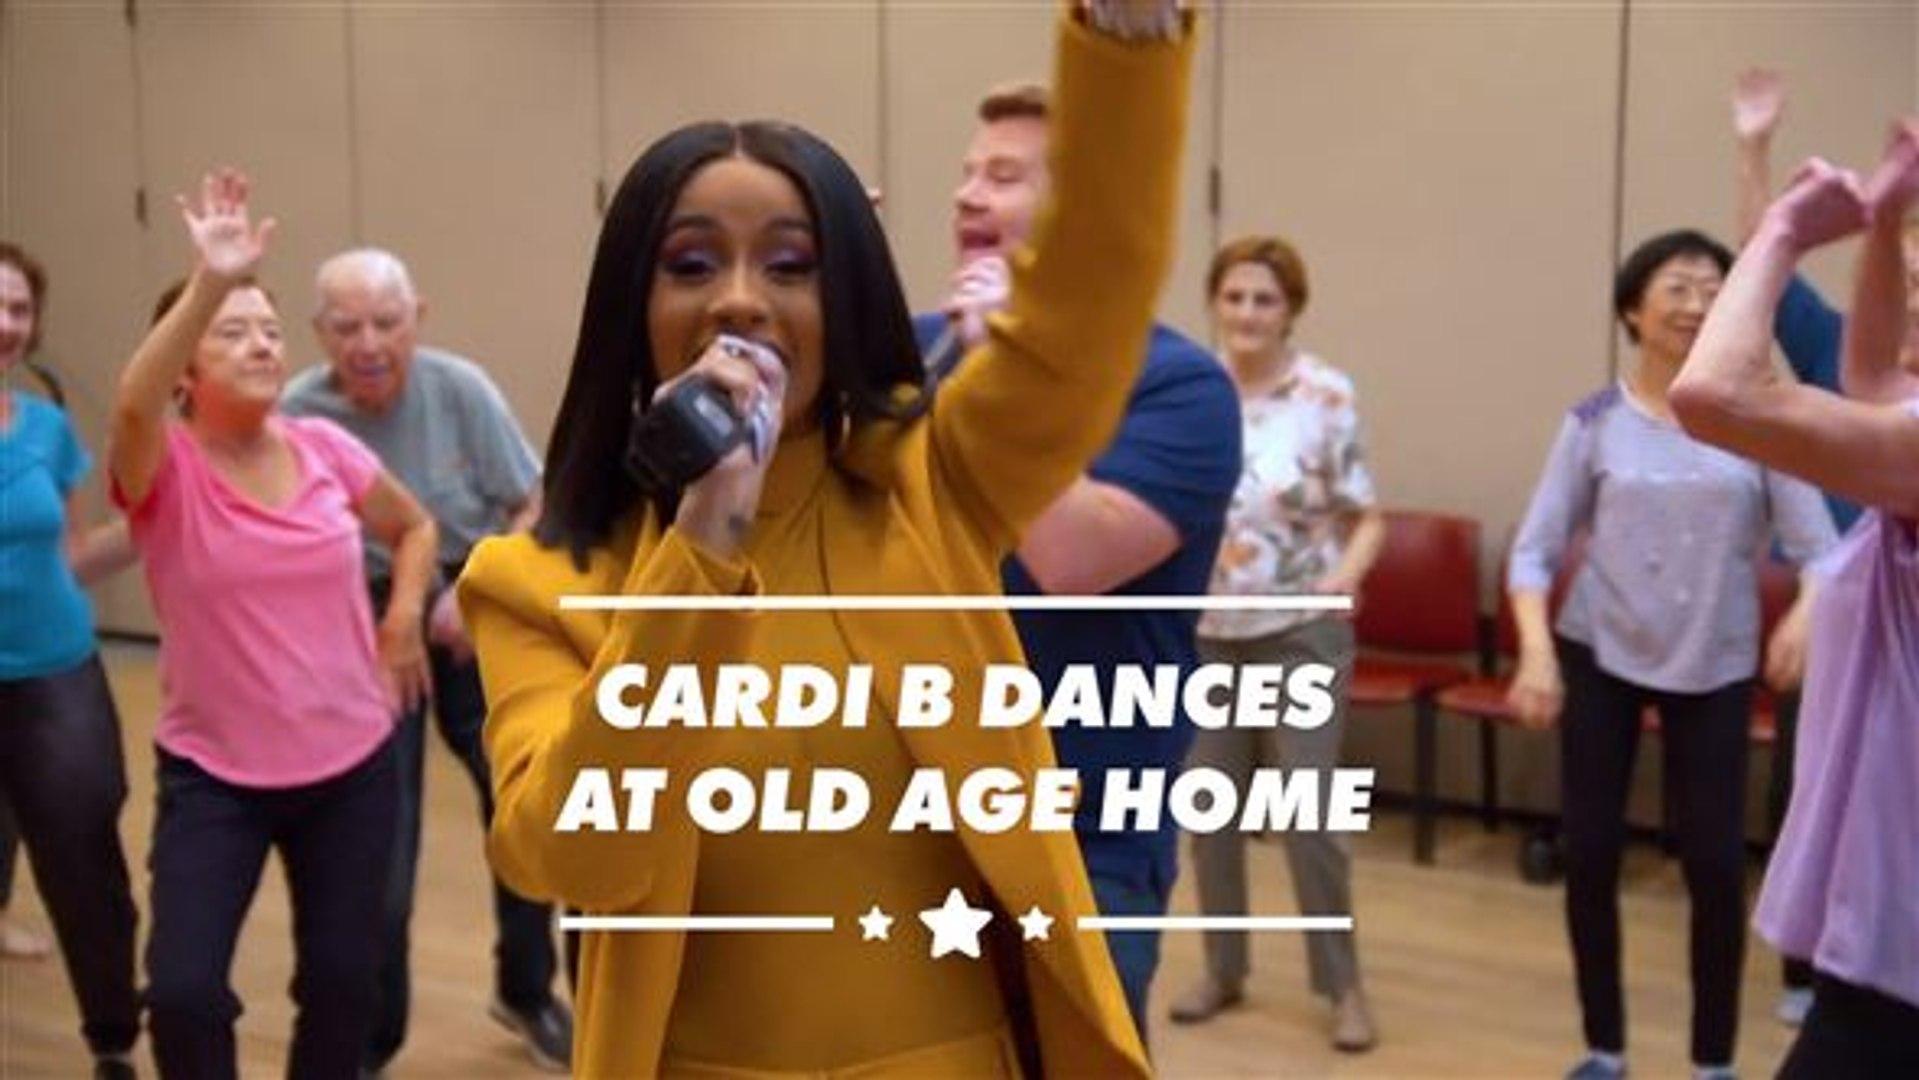 Cardi B Performs For Senior Citizens In Carpool Karaoke Video